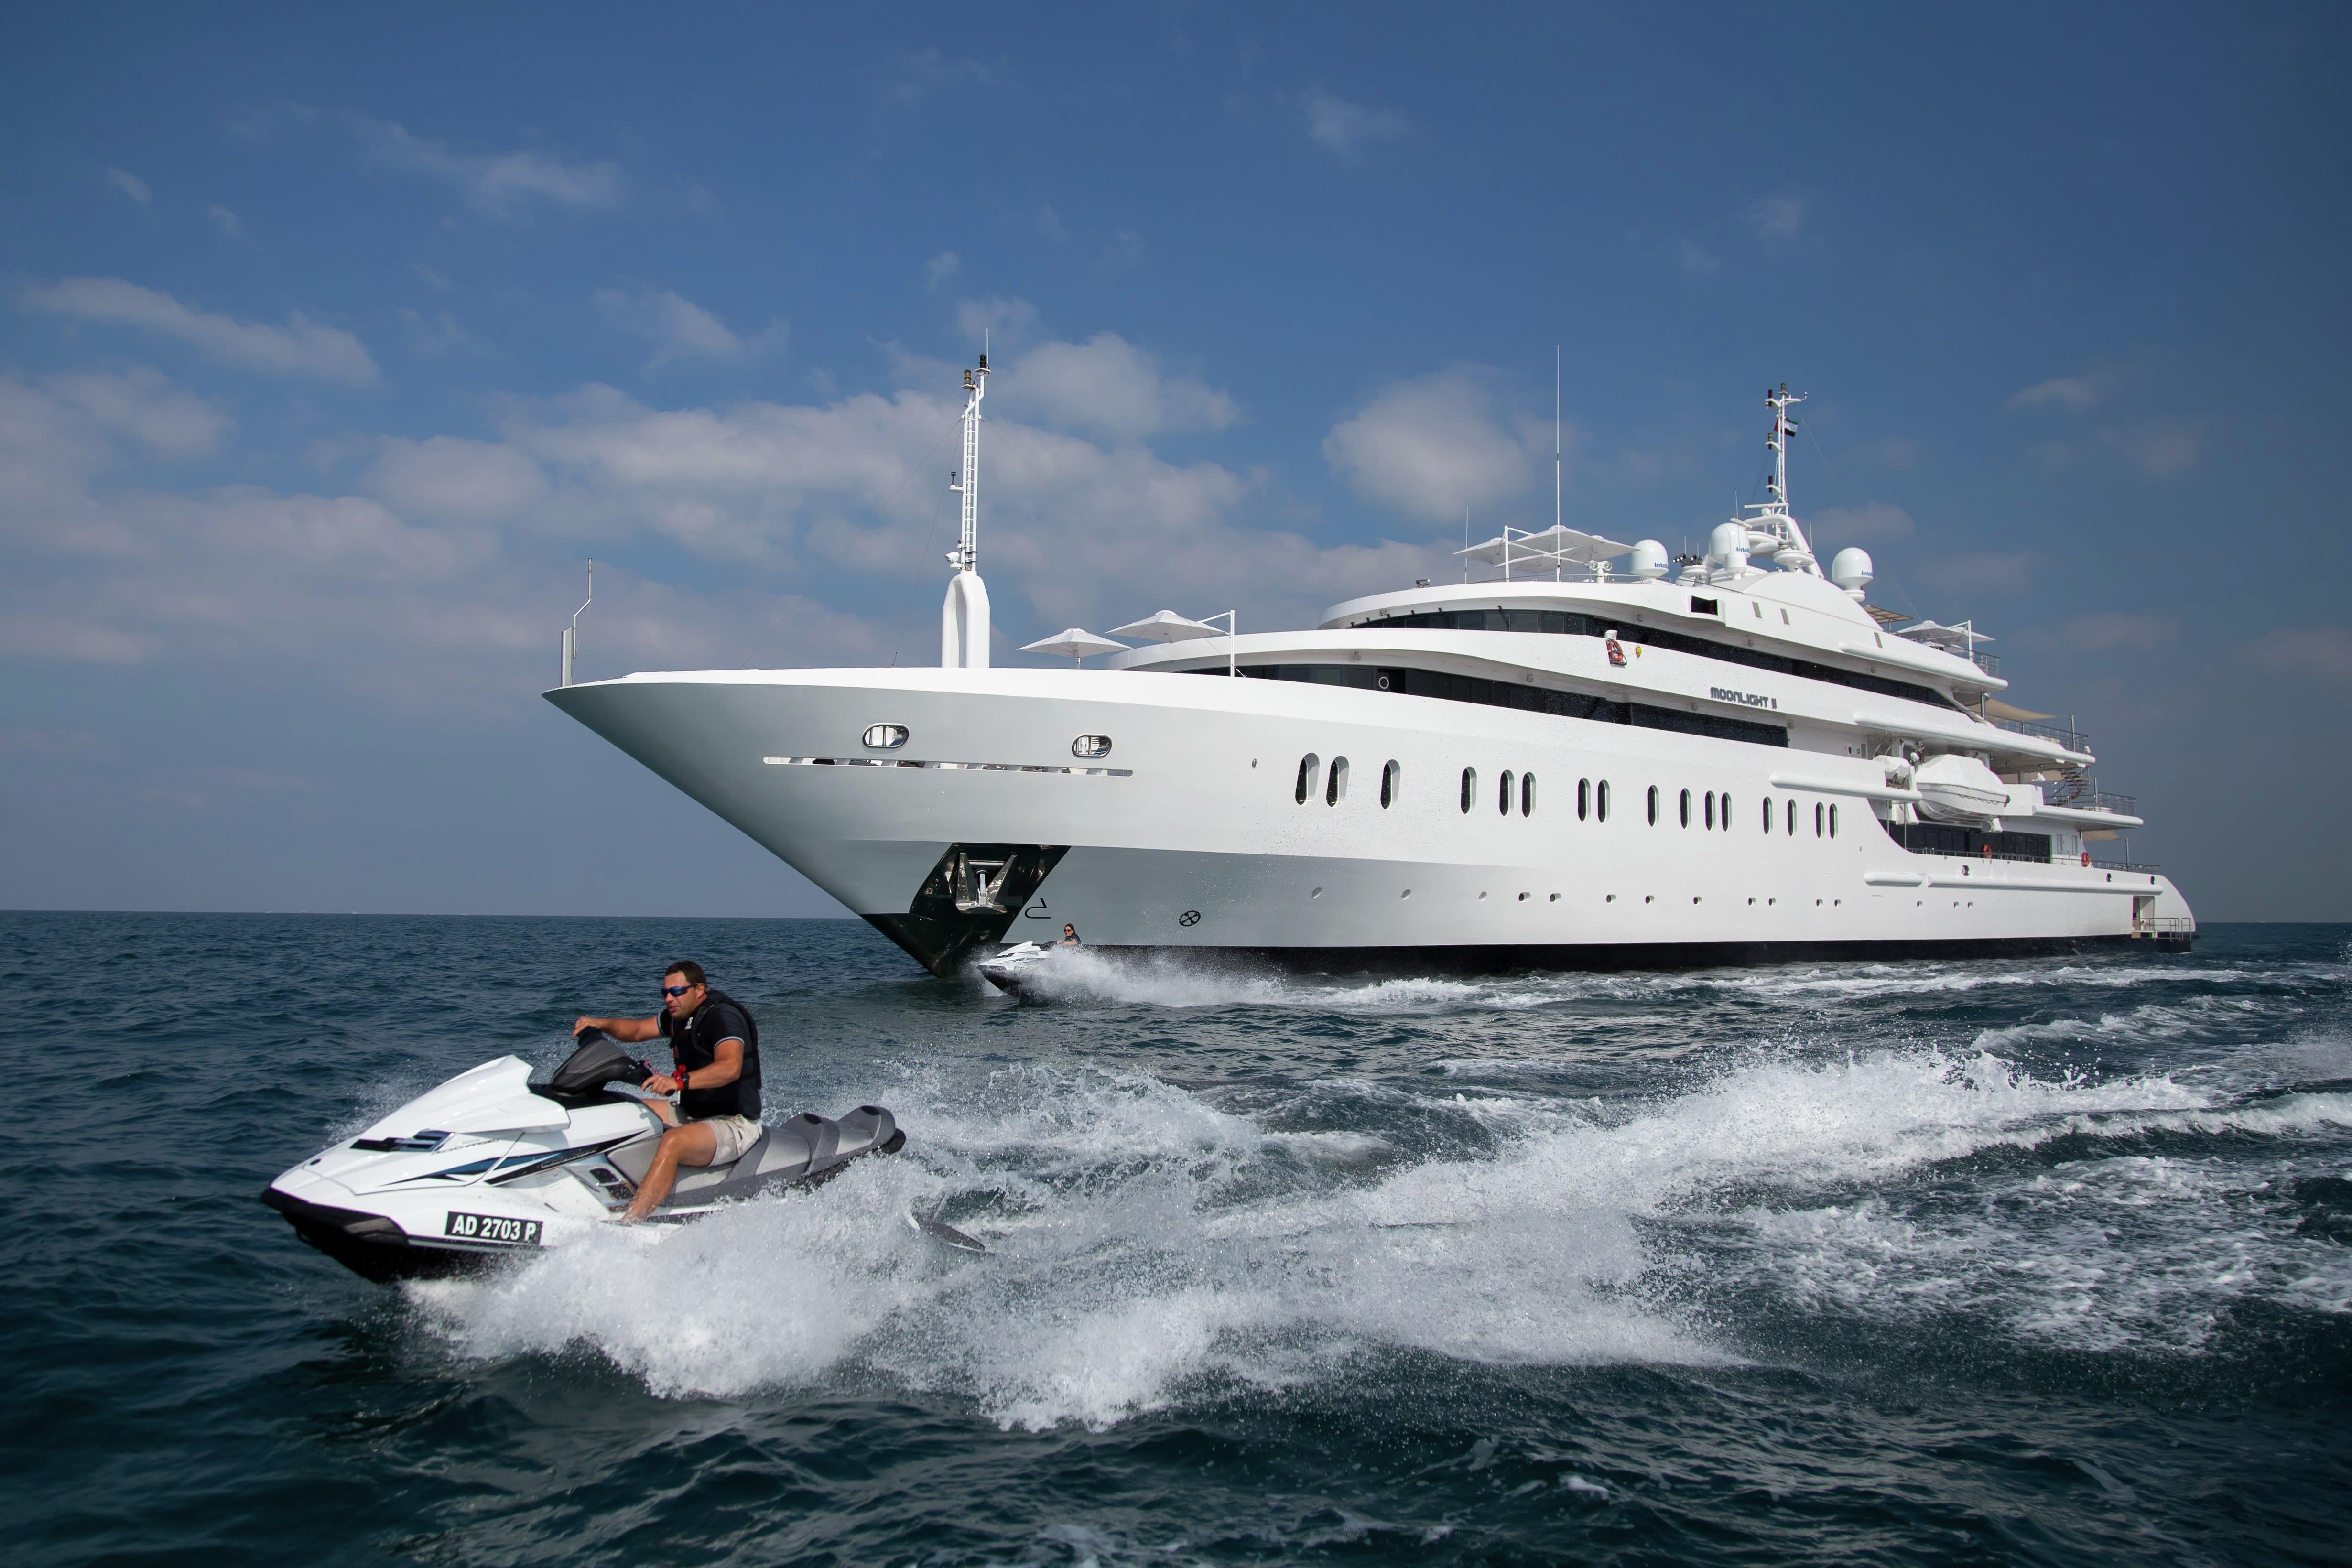 Image of Moonlight II 91.4M (299.9FT) motor yacht